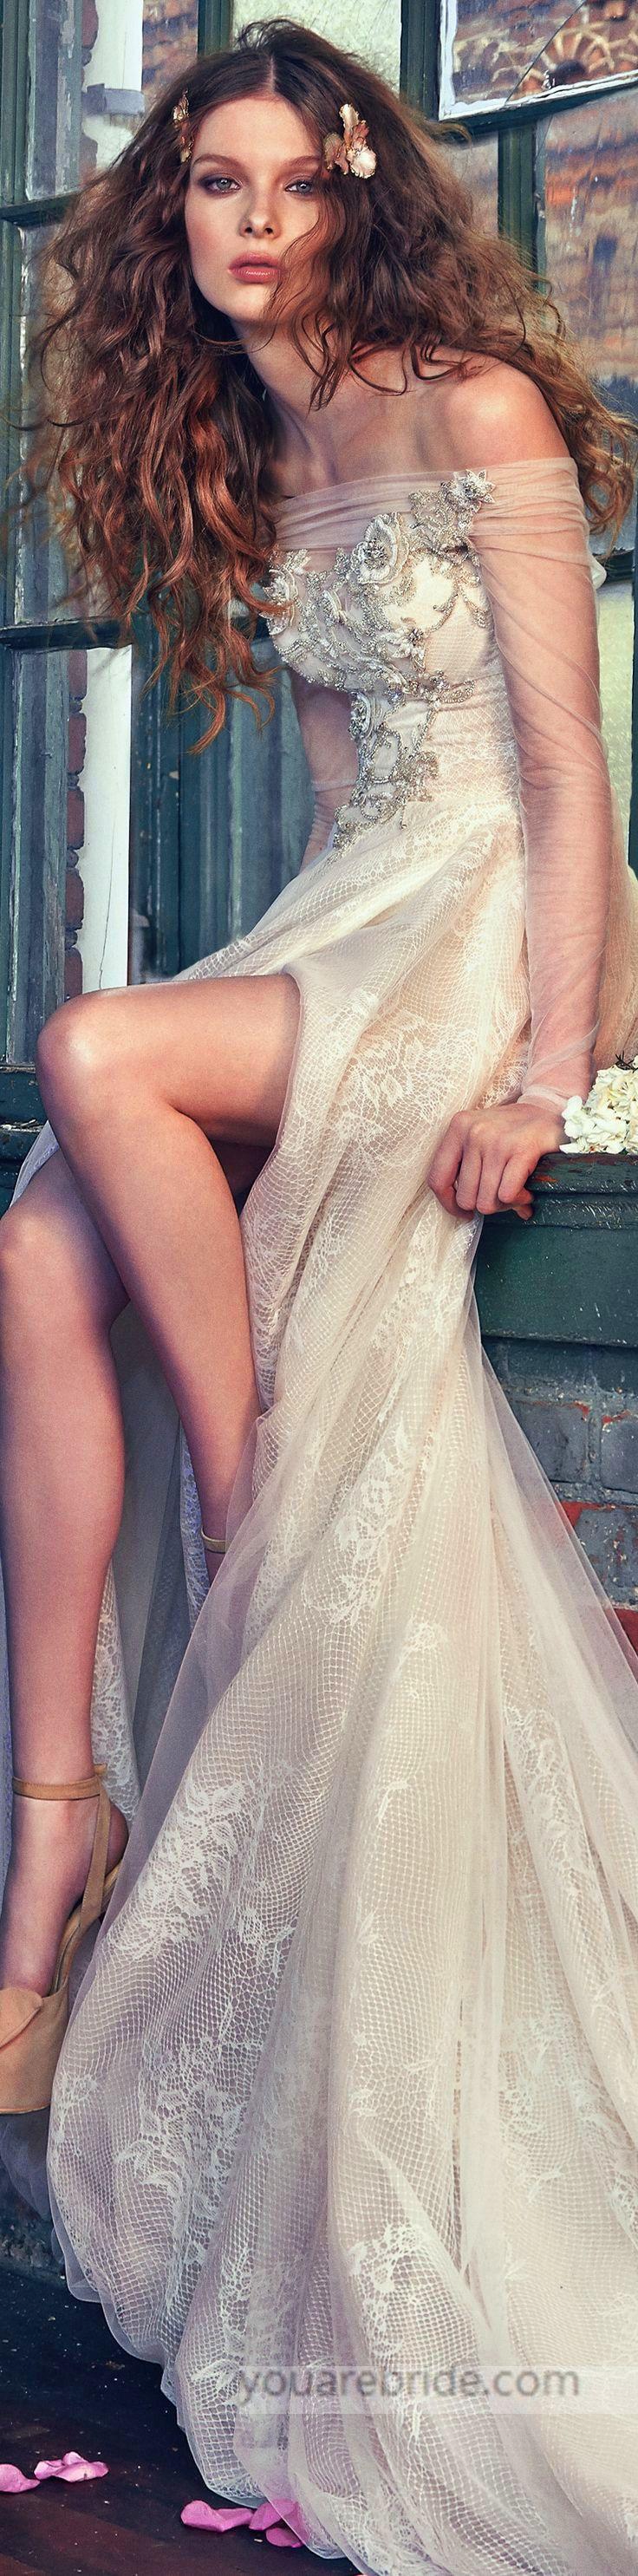 Best wedding dresses for athletic body type   best Wedding dresses images on Pinterest  Gown wedding Groom